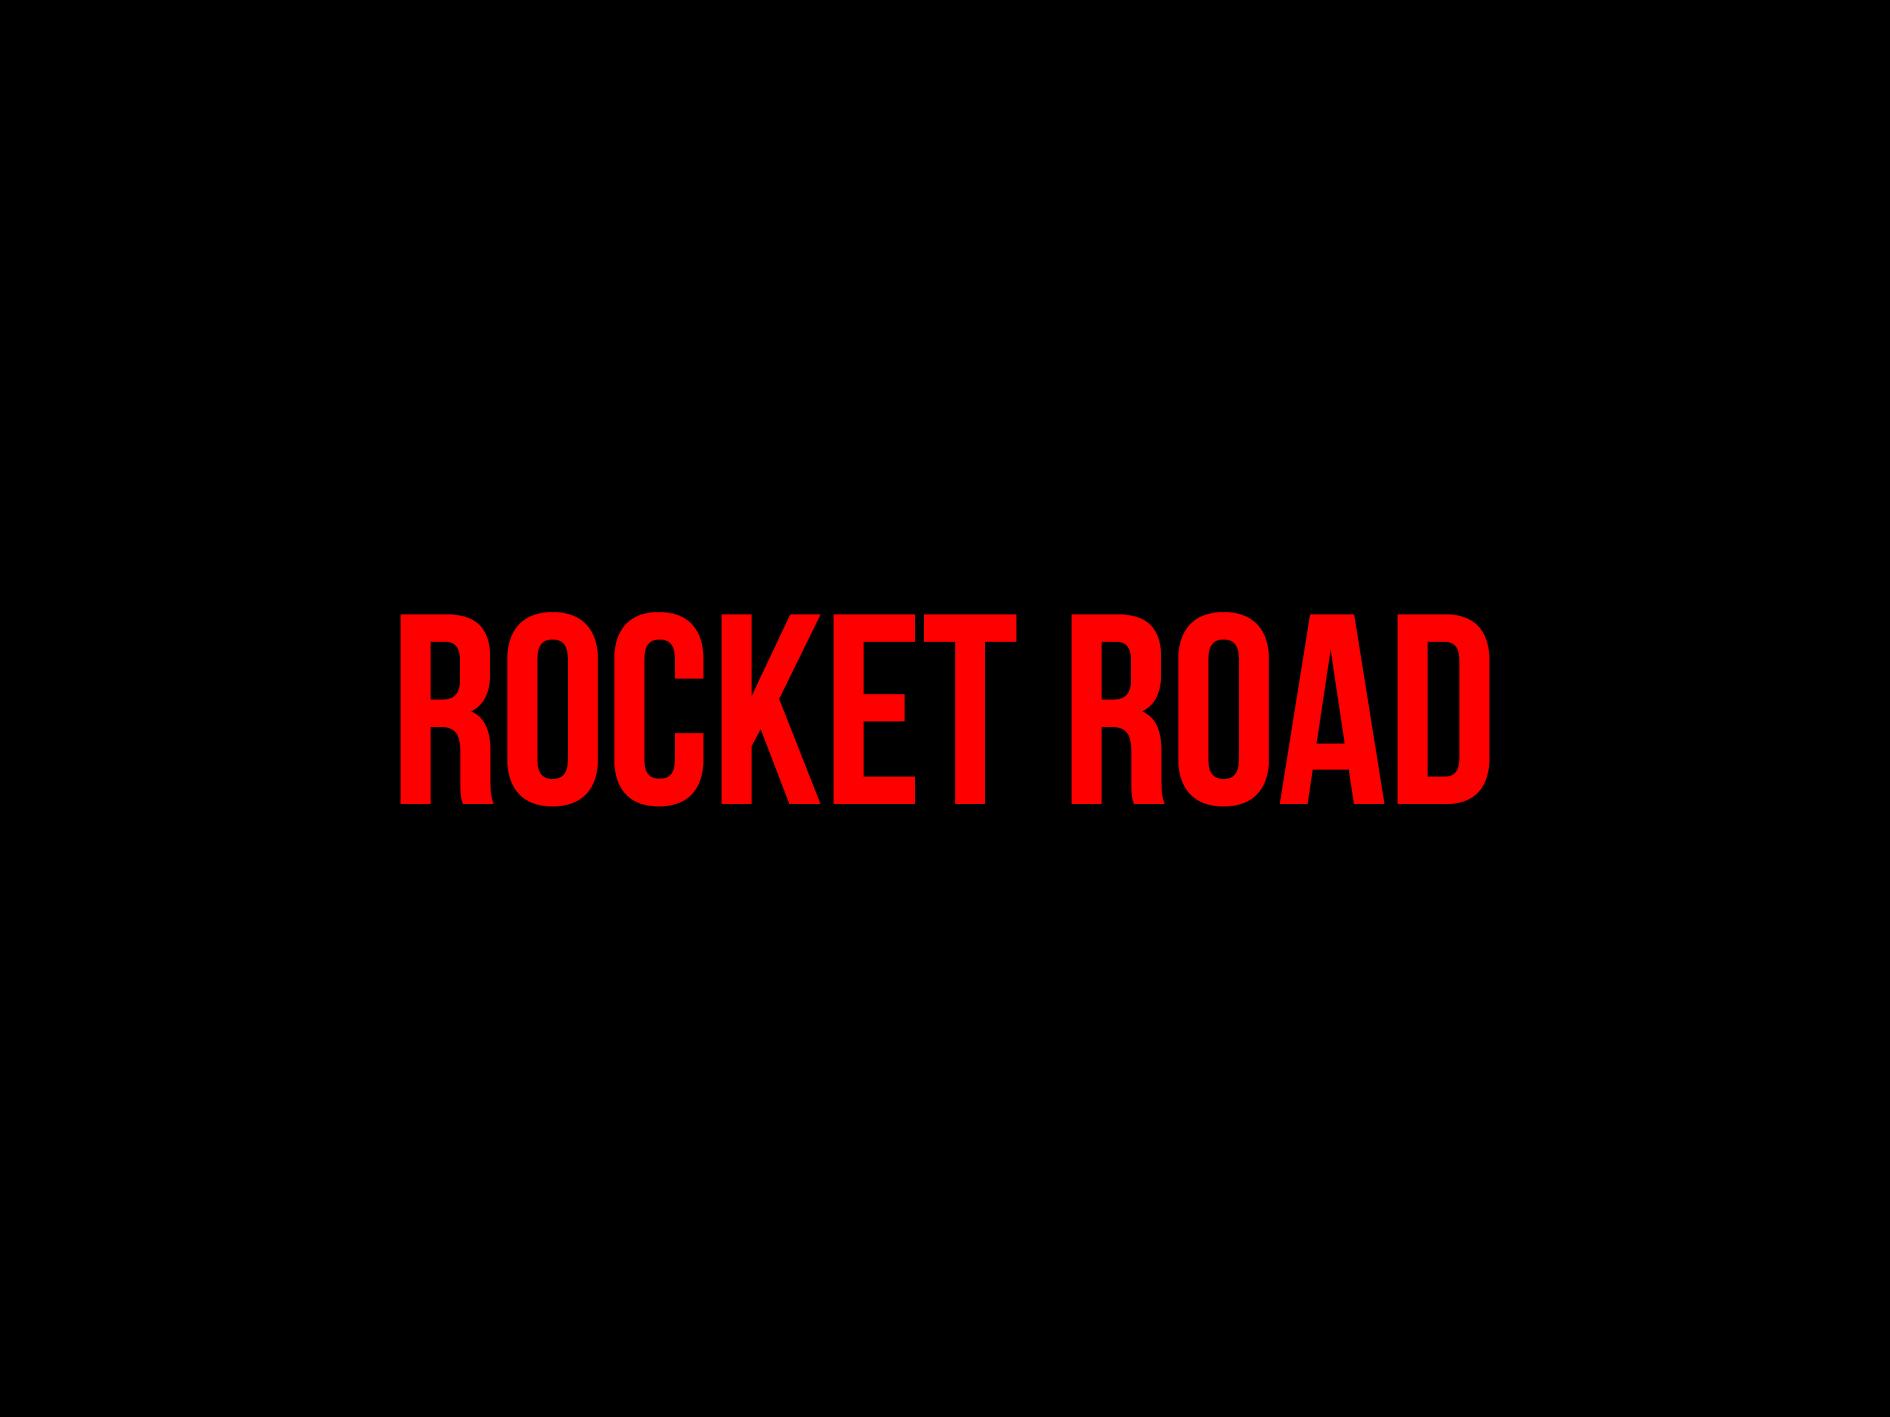 Rocket Road!